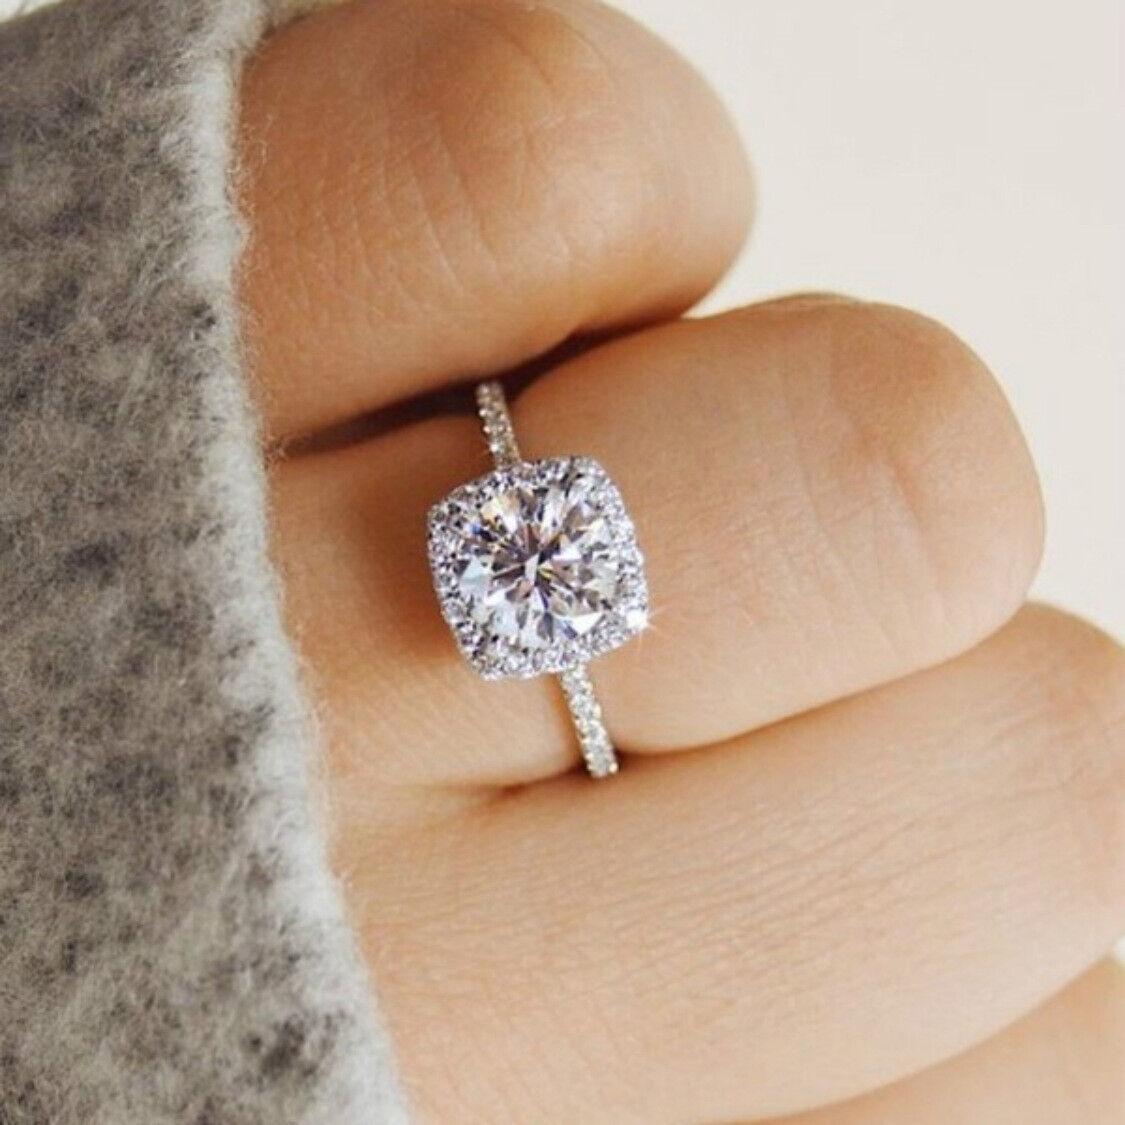 2Ct Round Cut Diamond Halo Unique Women's Engagement Ring 14k White Gold Finish